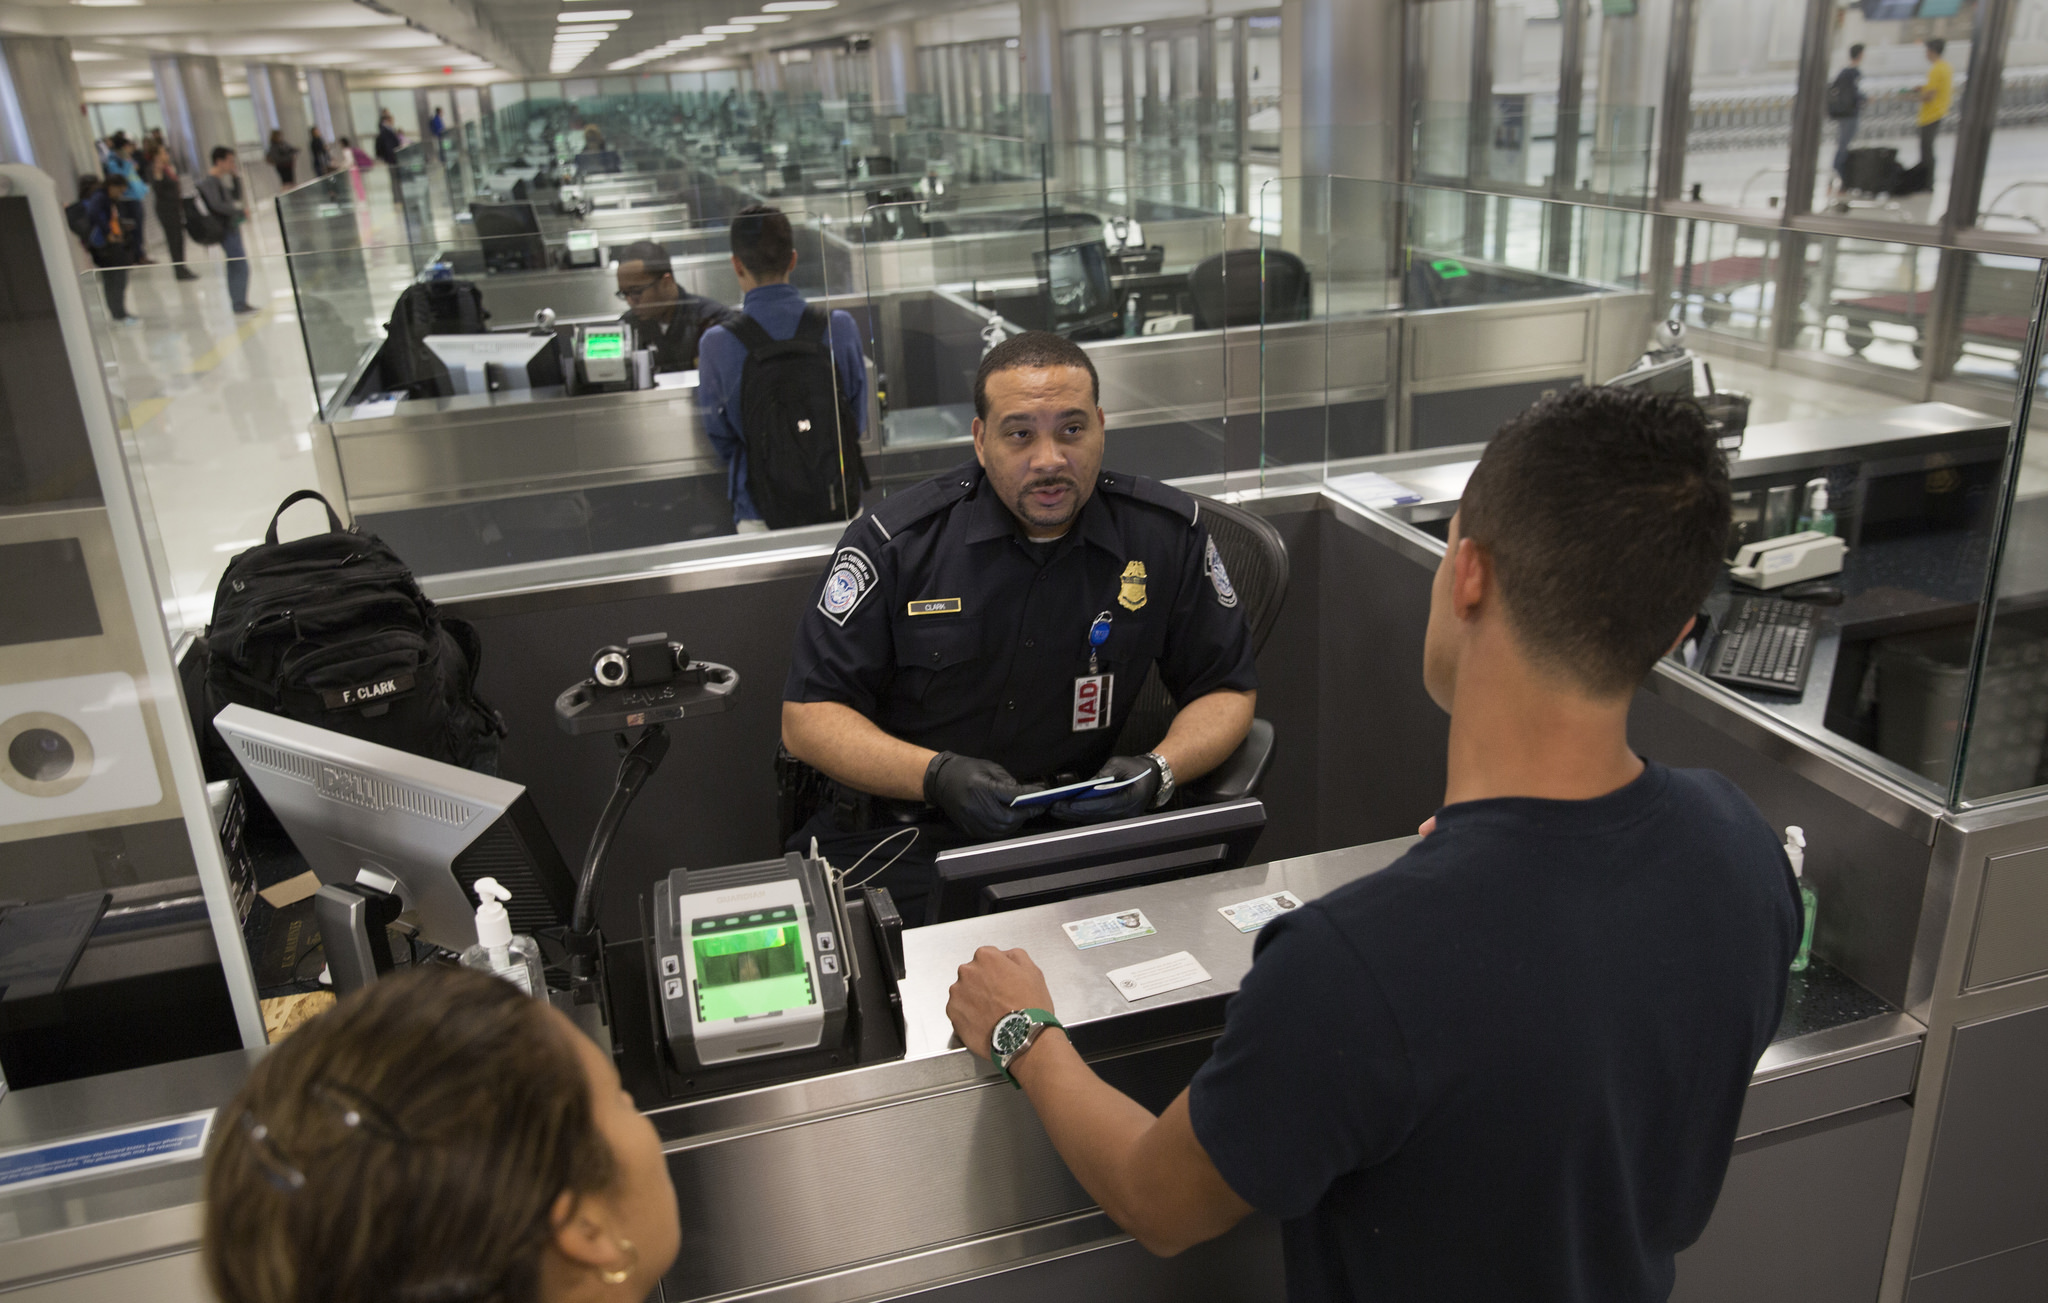 https://www.cnewyork.net/wp-content/uploads/2017/03/immigration-us-new-york-4.jpg